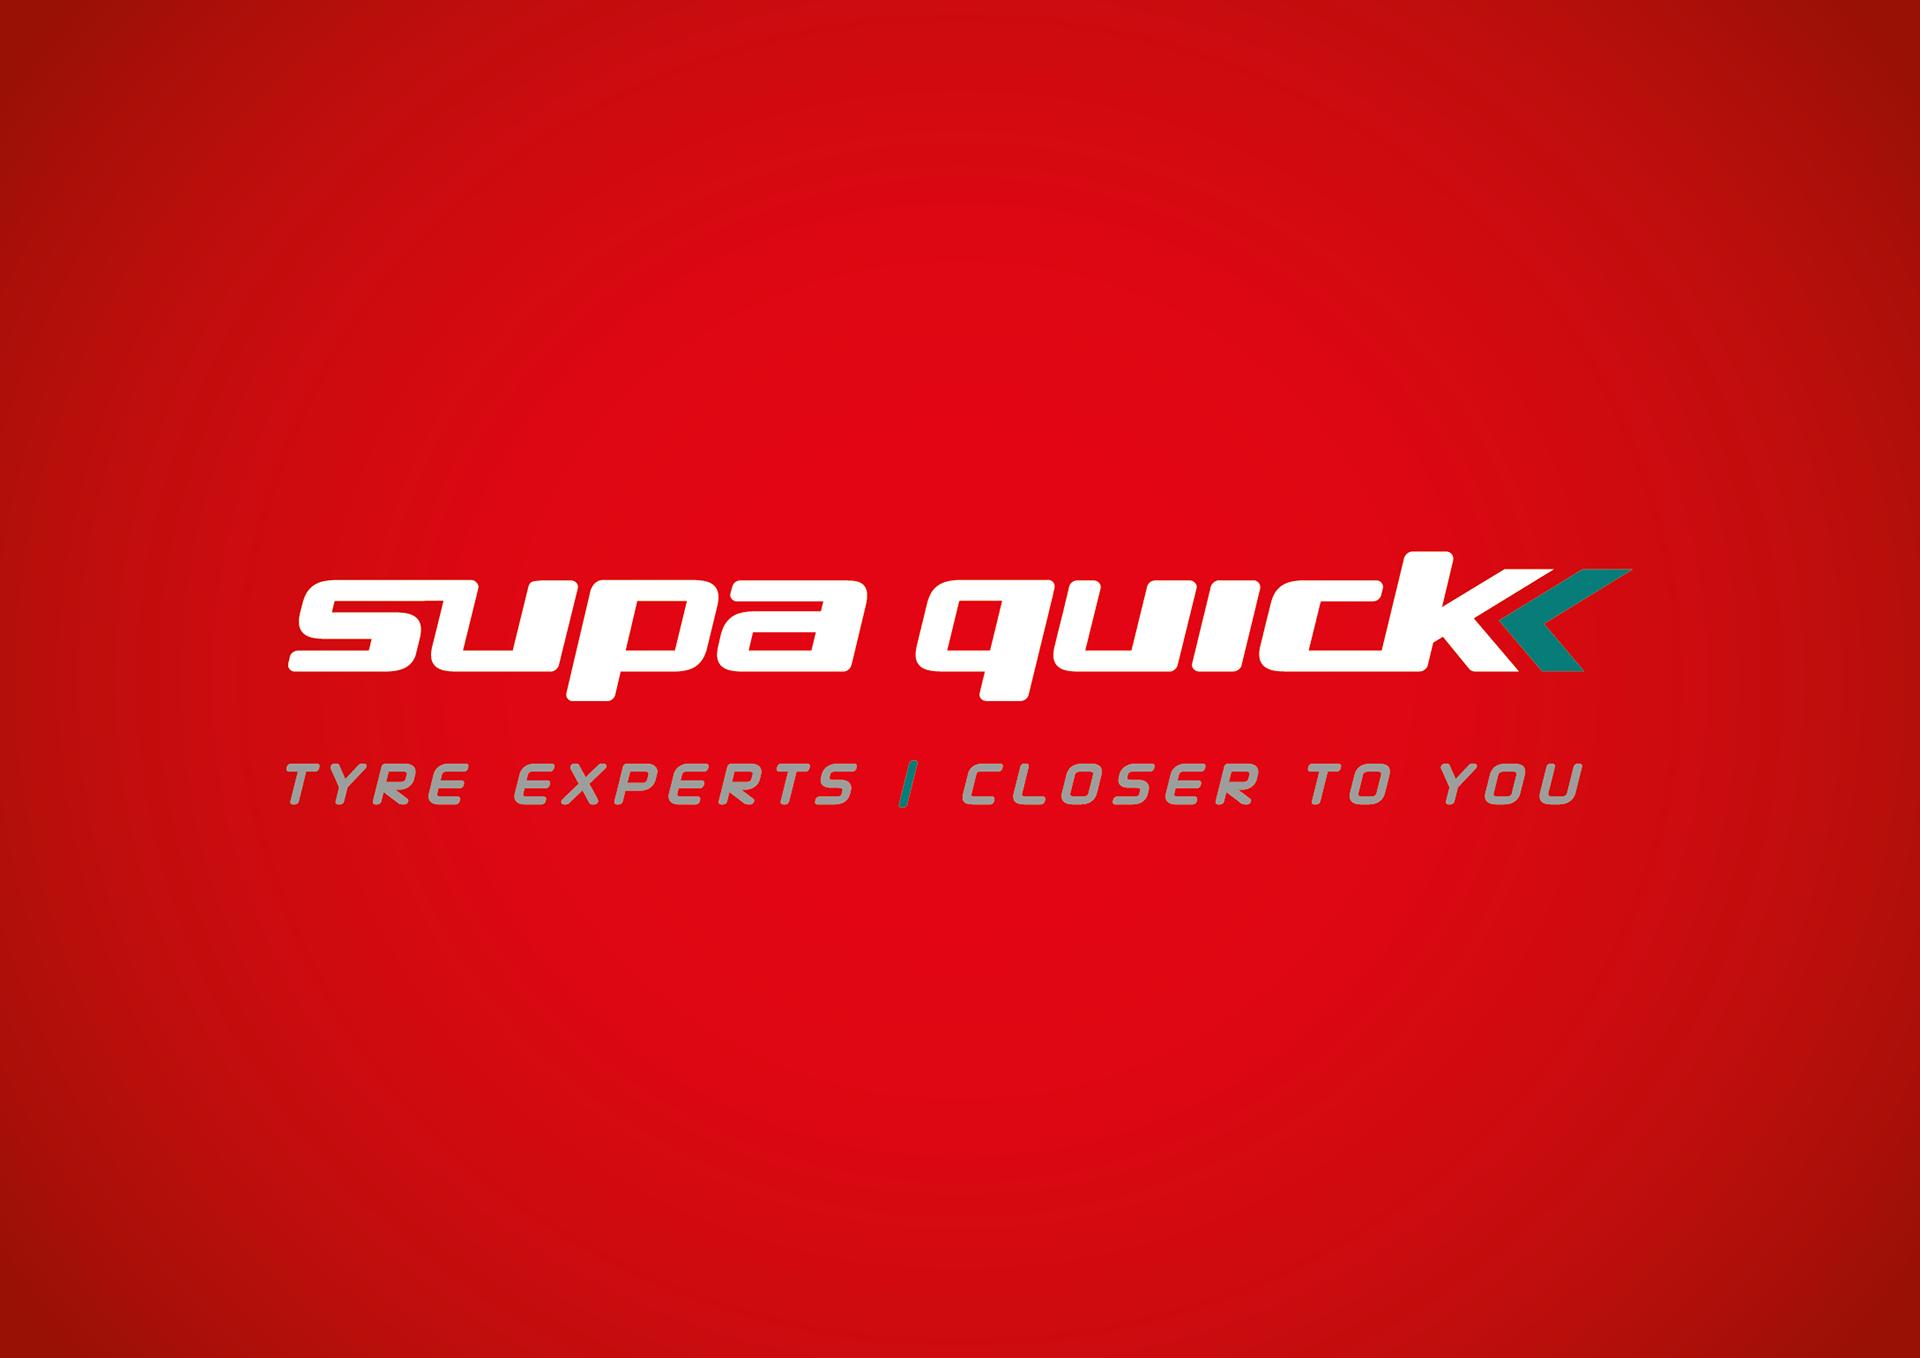 turbine design supa quick logo overhaul